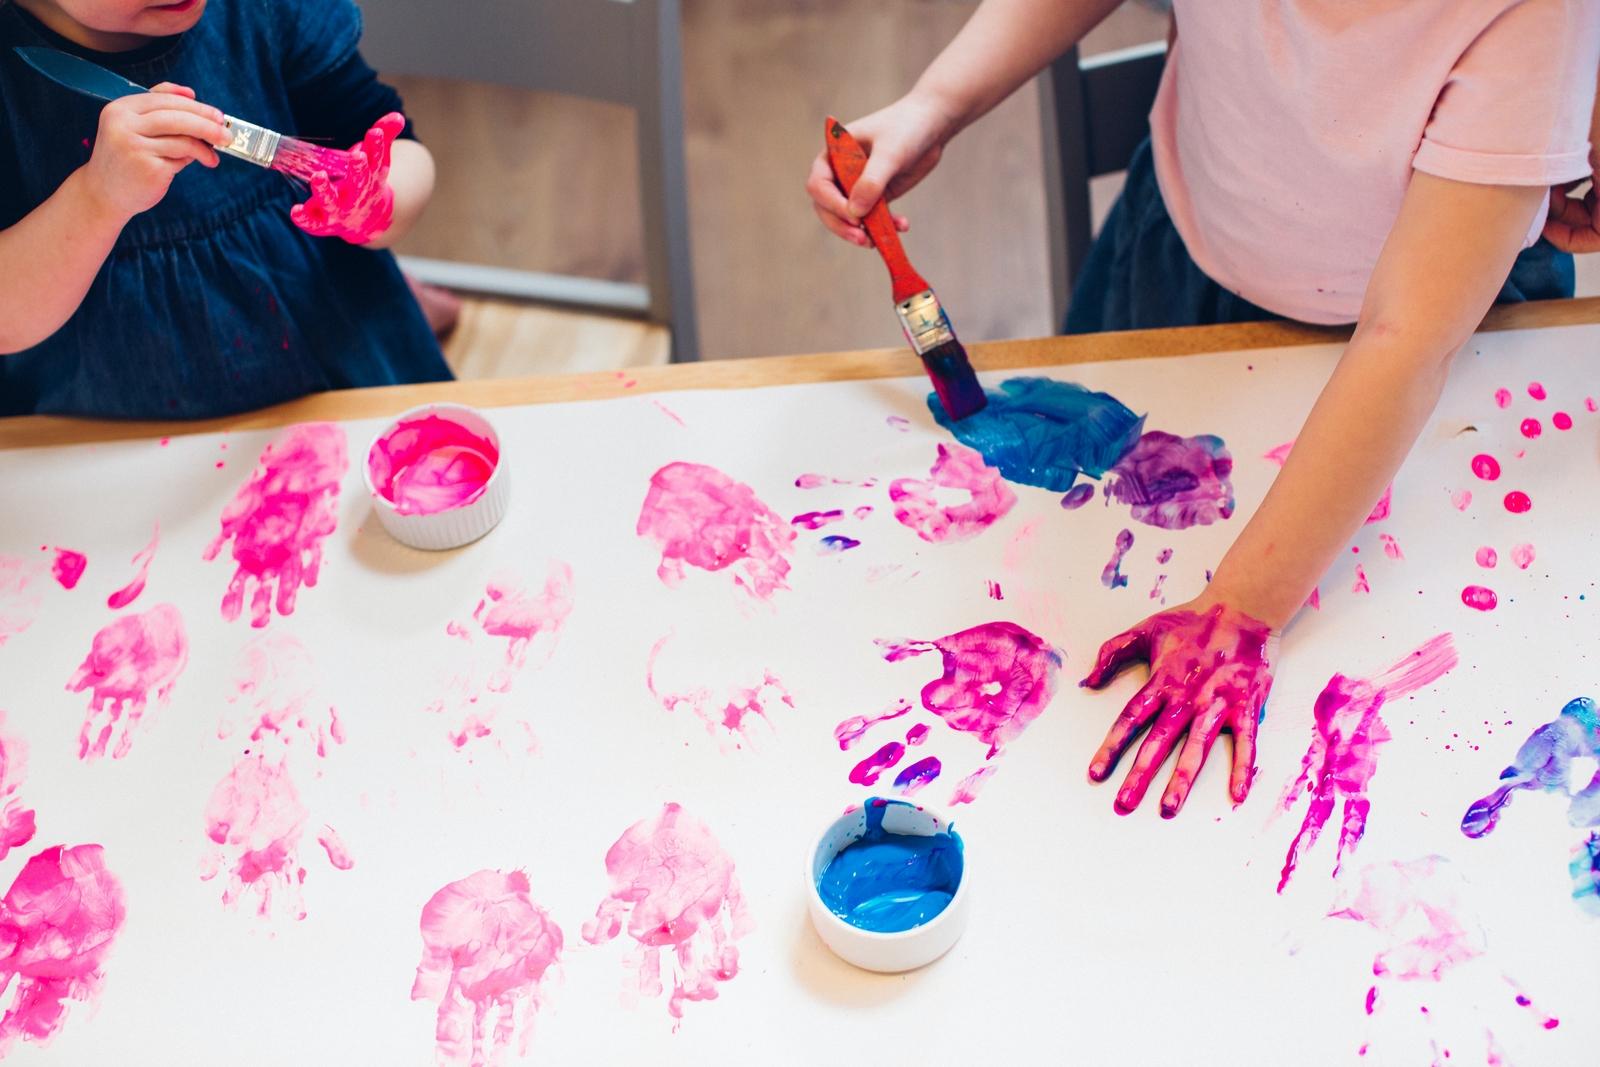 Stop Treating Creativity As an Option